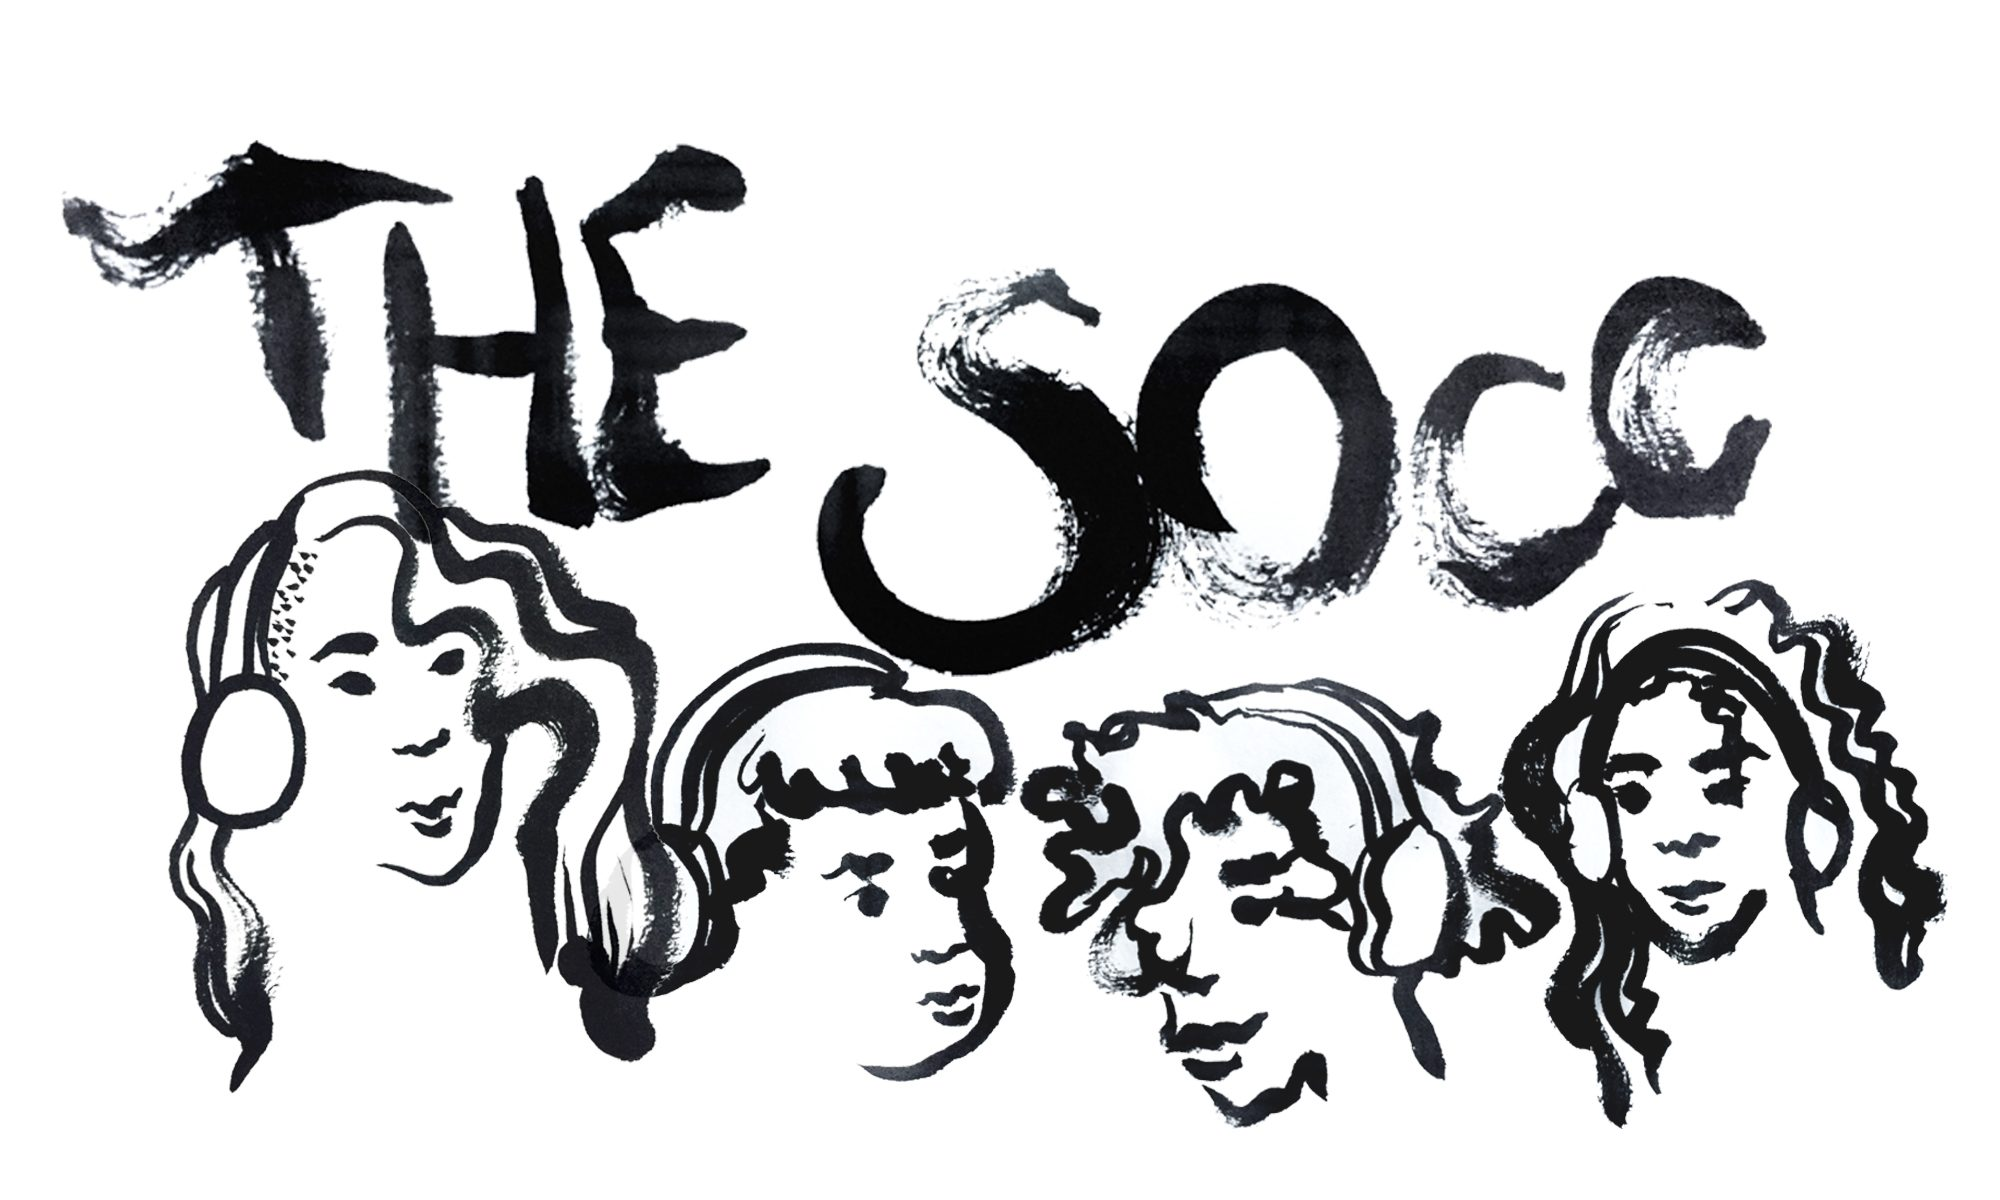 The SoCC